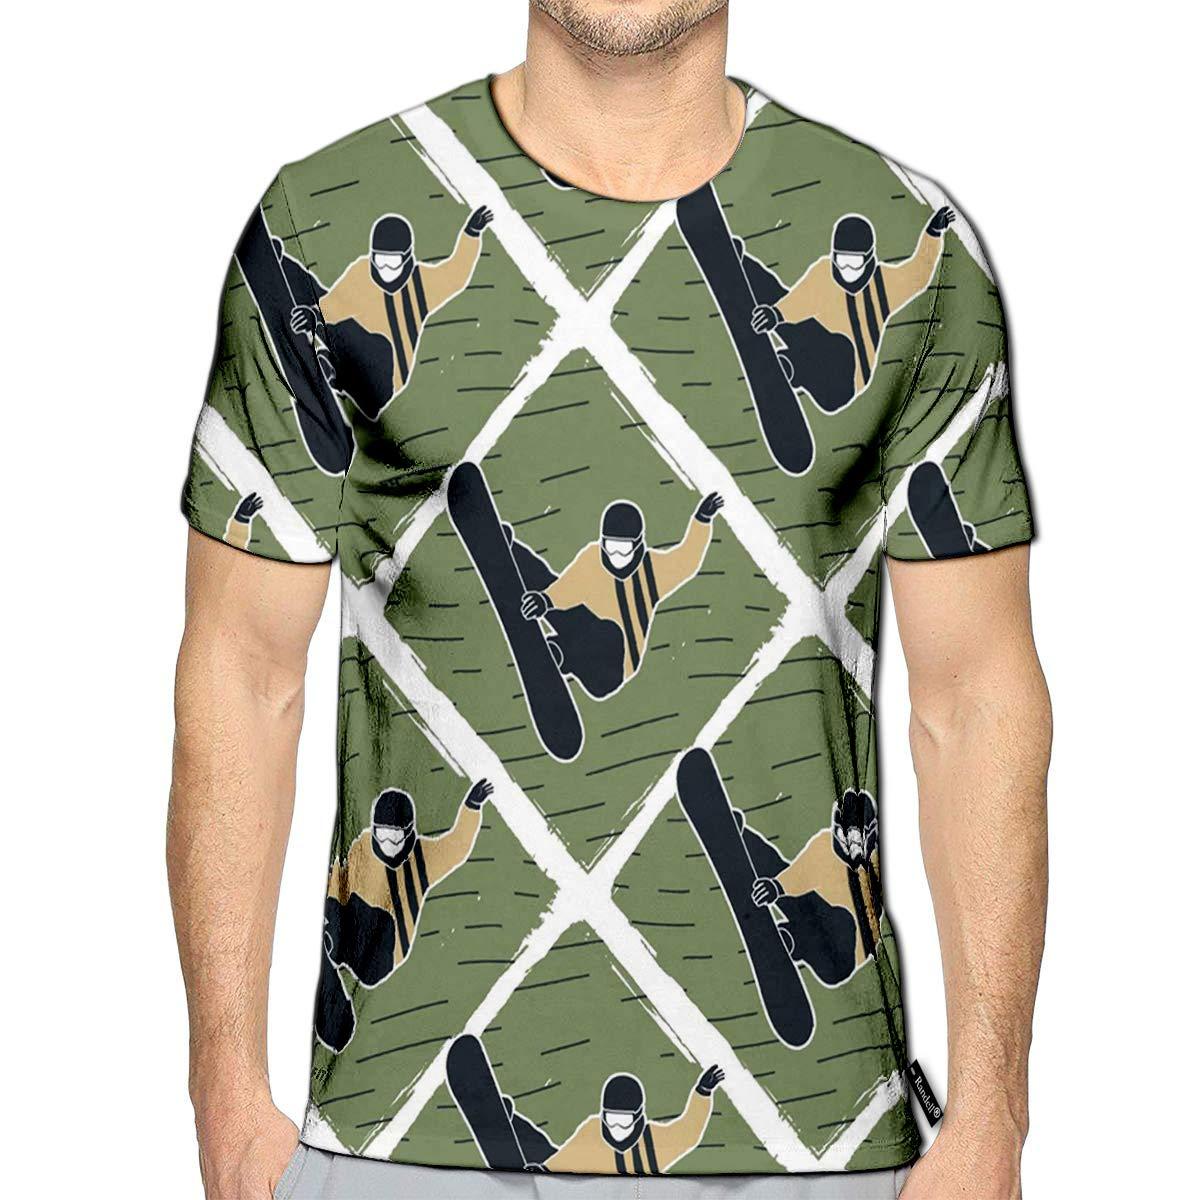 3D Printed T-Shirts Snowboard Man Winter Ski Retro Color Design Pattern with SNO